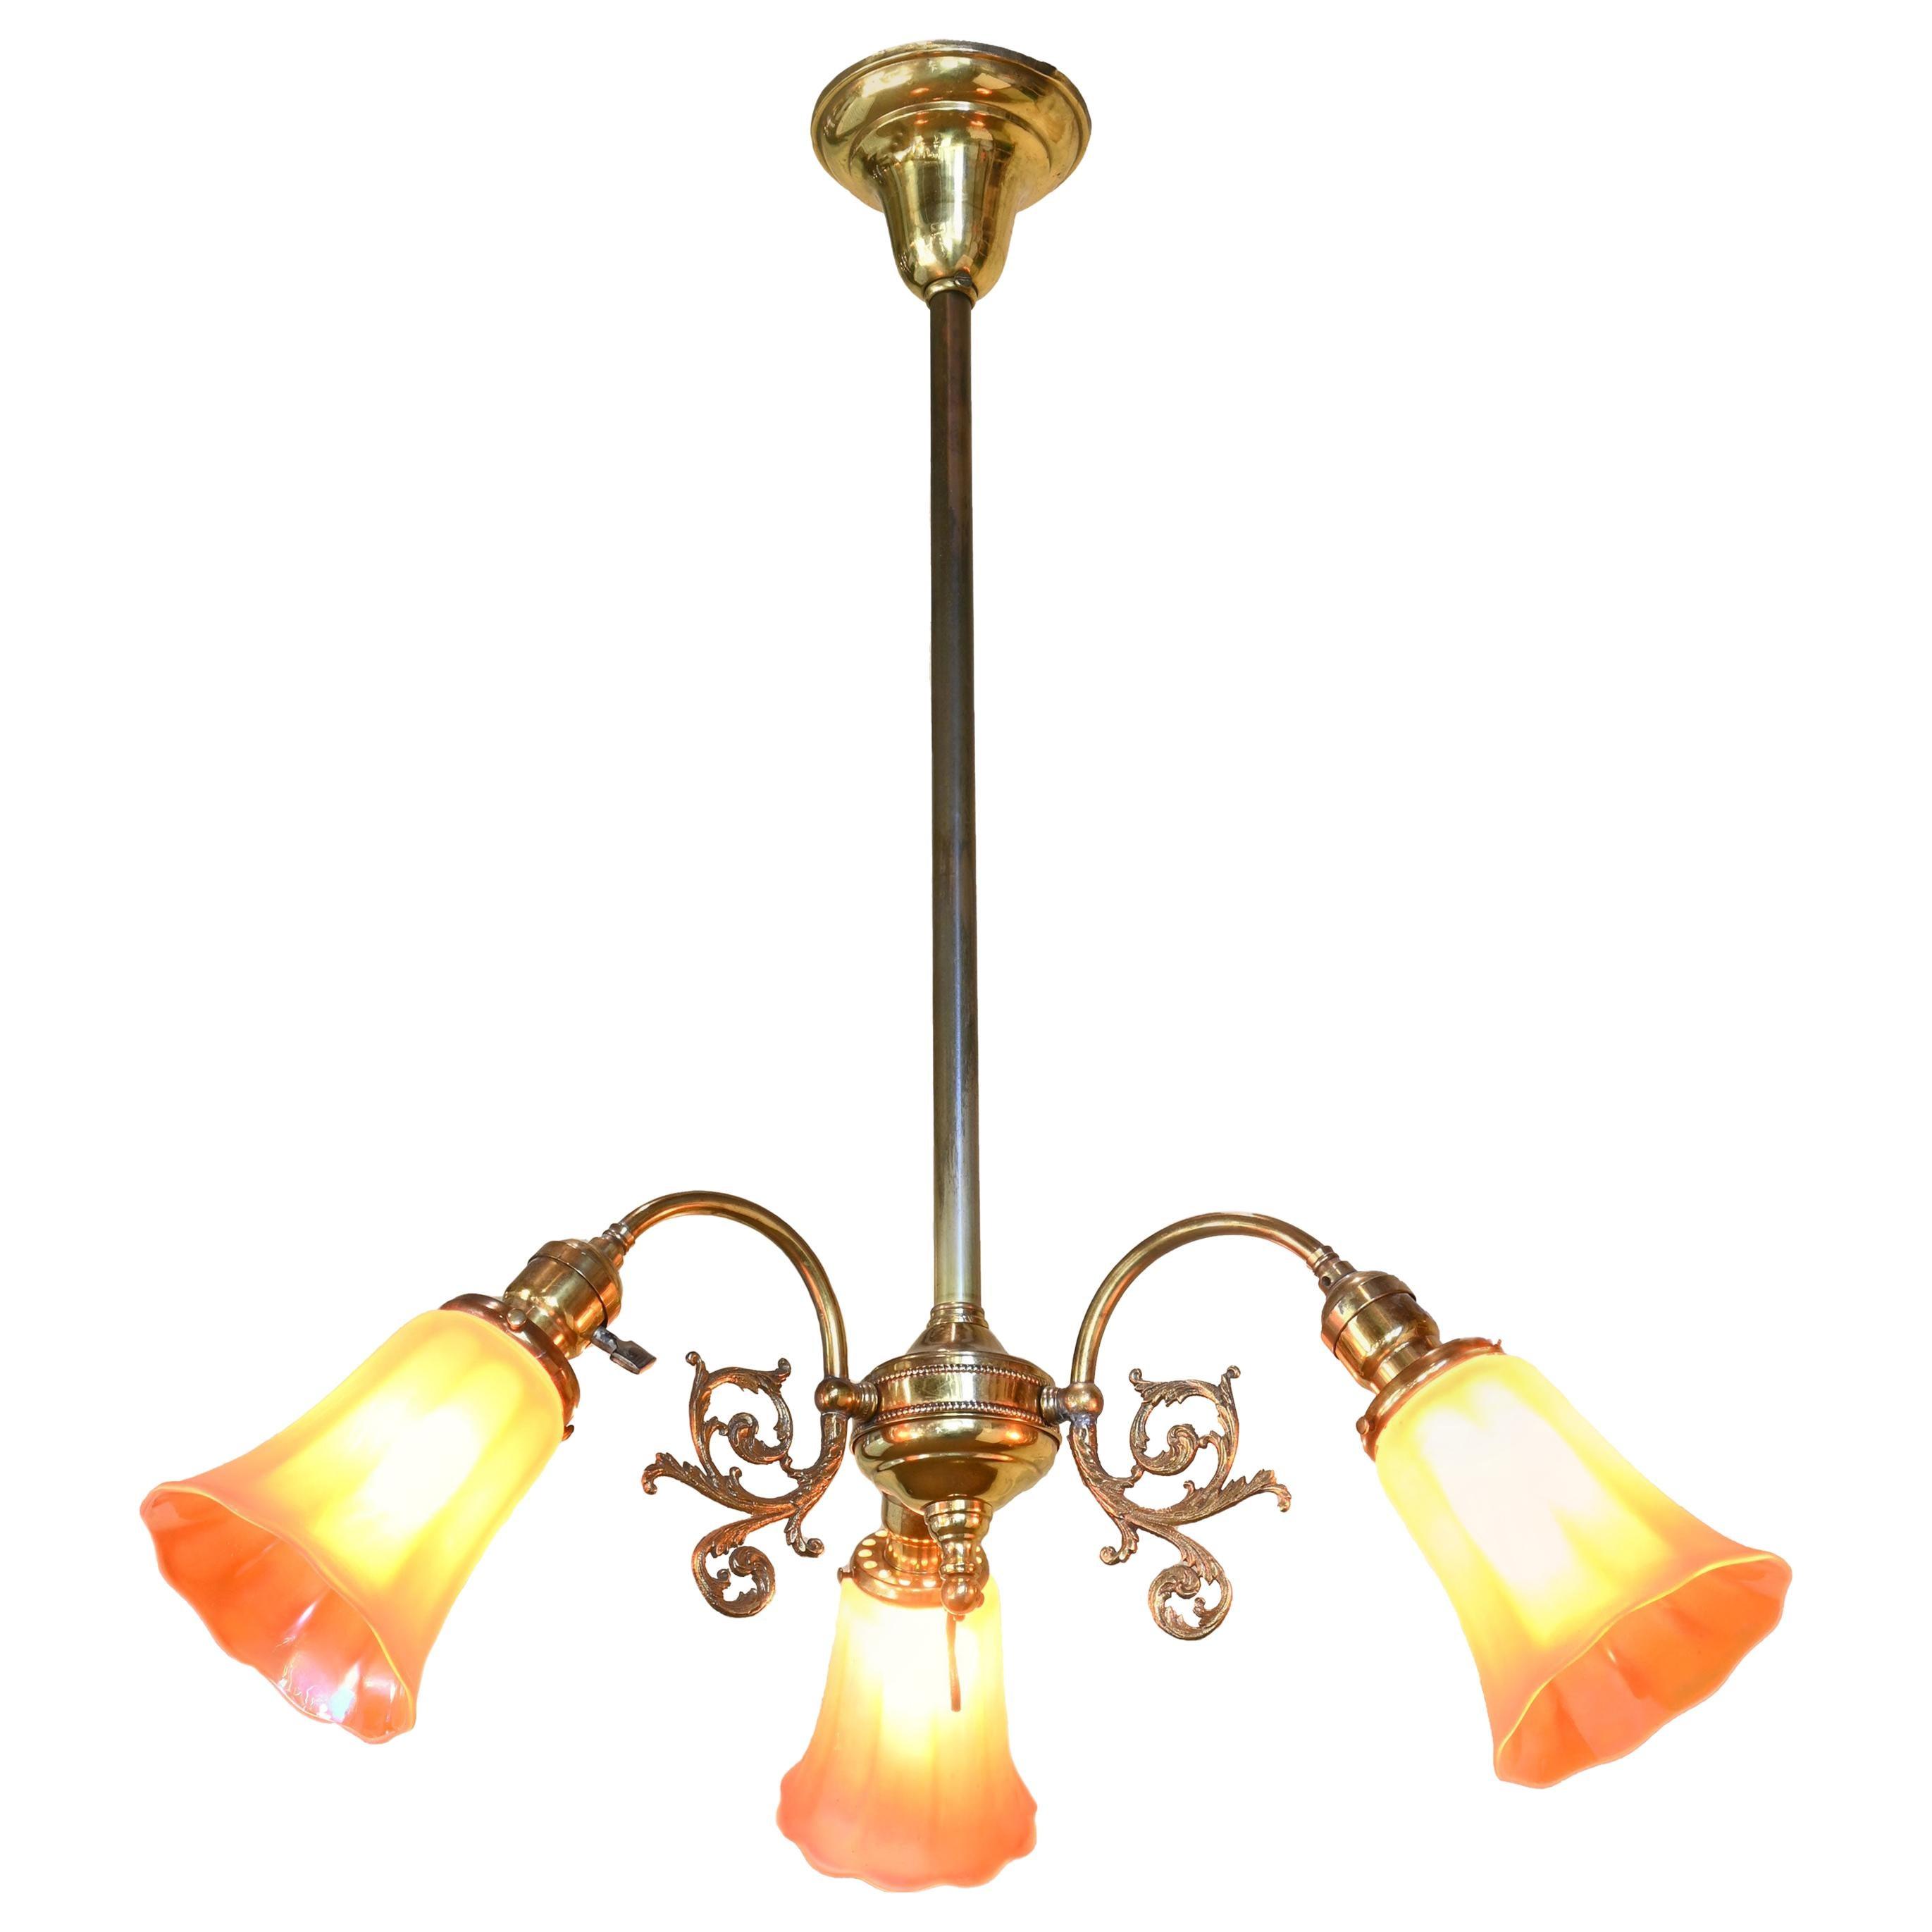 Brass Three-Light Chandelier with Nuart Shades